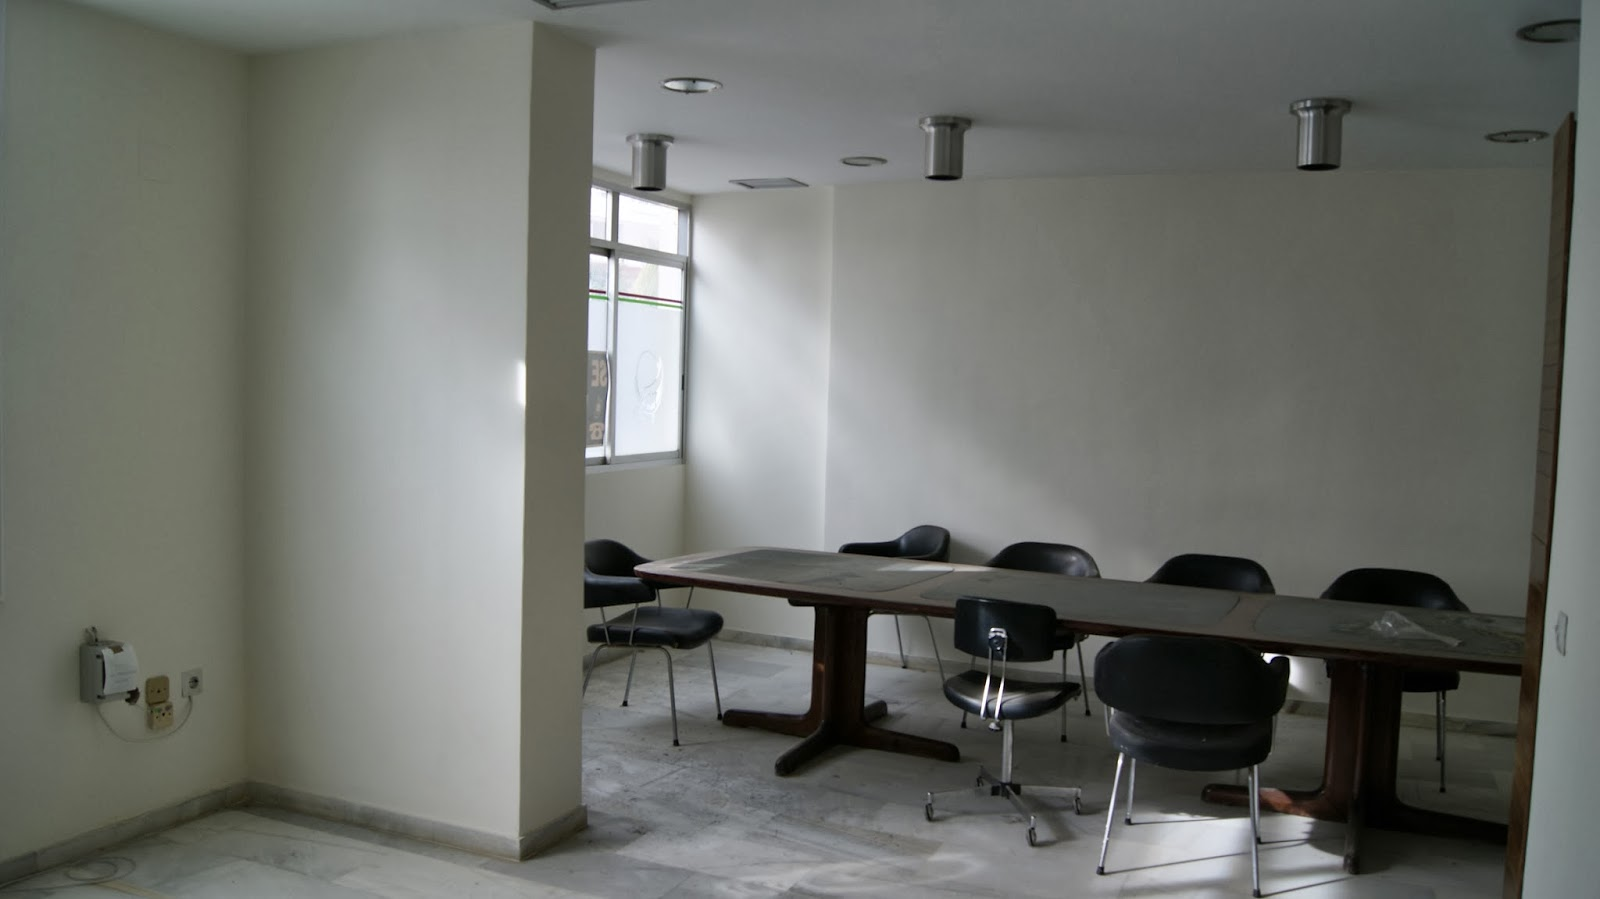 Alquileres torremolinos oficinas 350m2 12 despachos for Alquileres oficinas